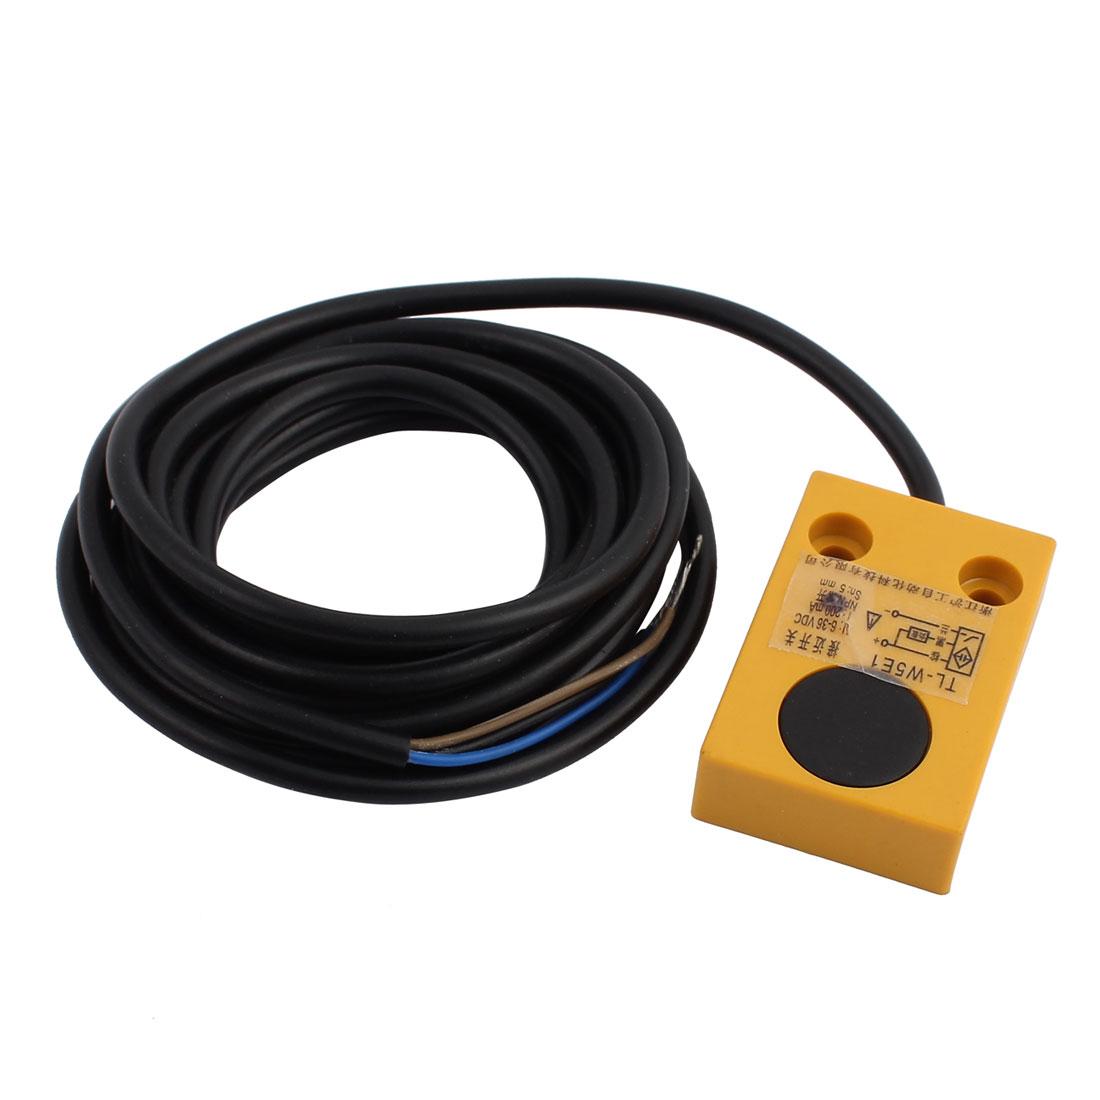 TL-W5E1 DC 6-36V 200mA NPN NO 5mm Inductive Proximity Sensor Switch 3-wire